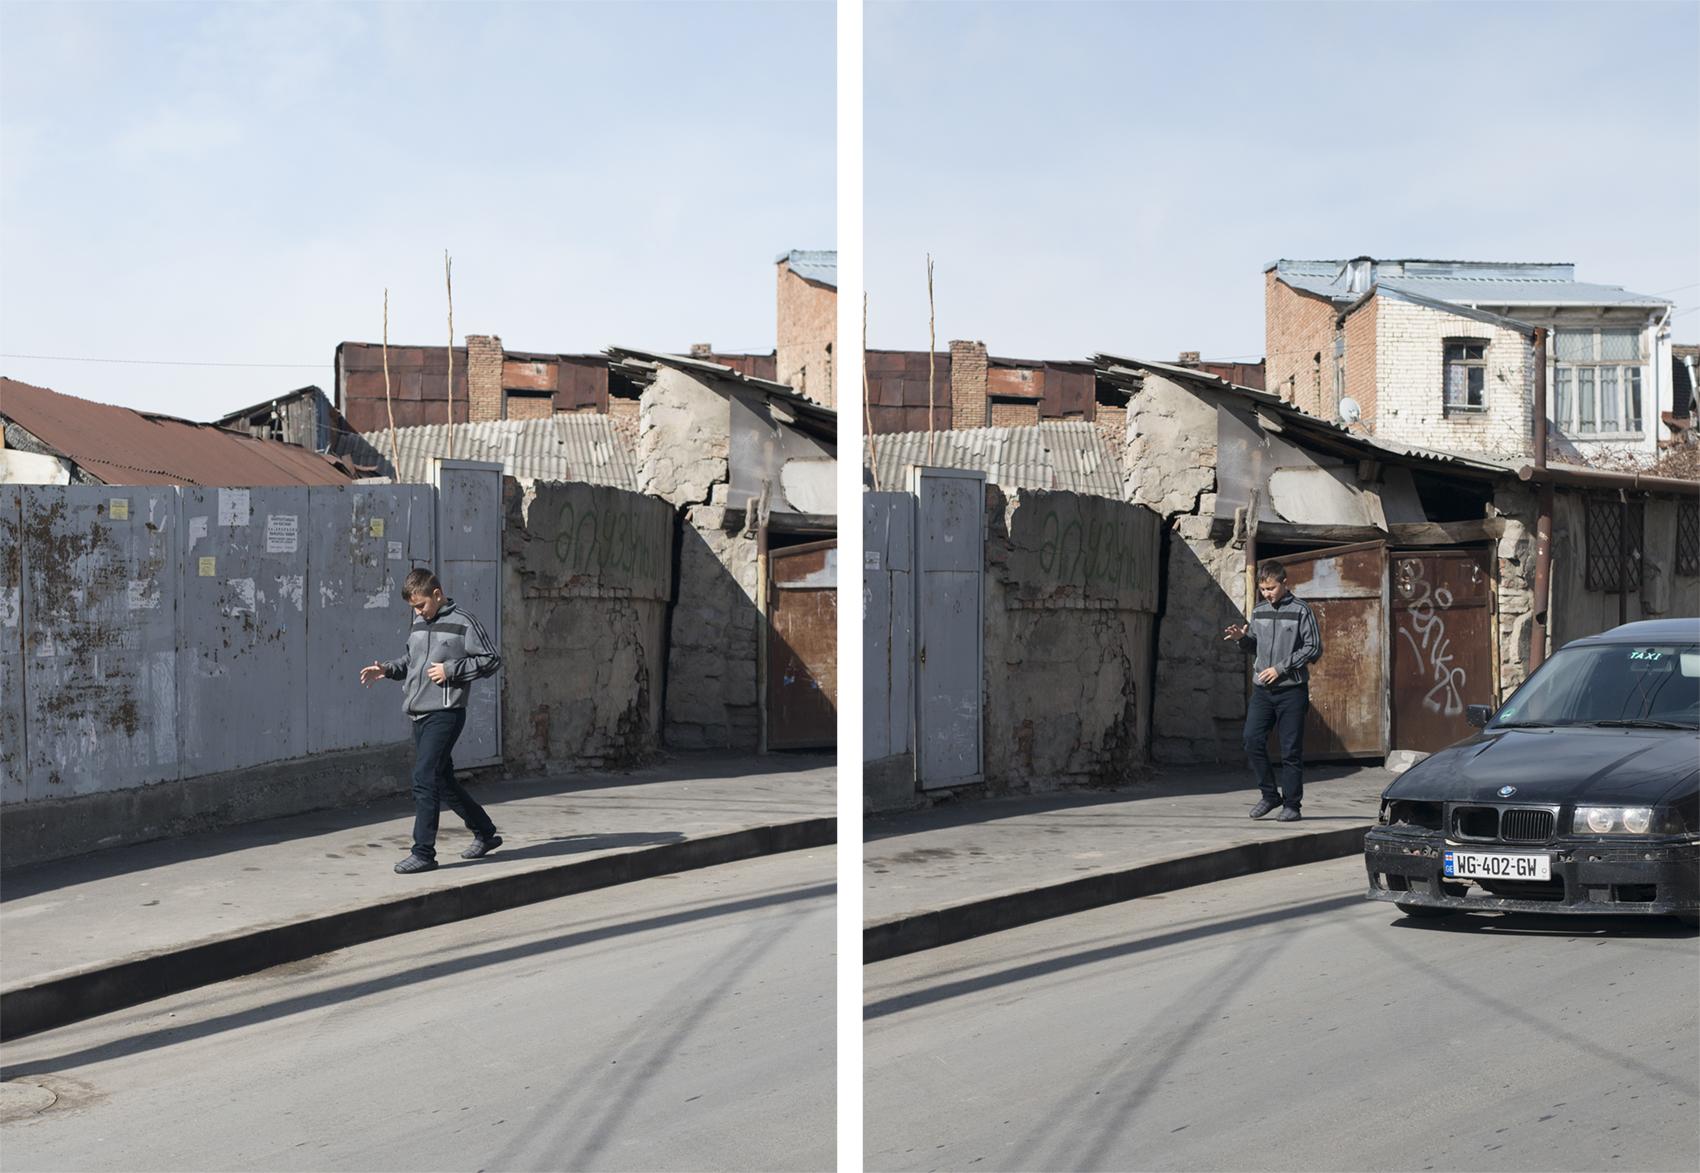 Fragments of a City, Tblisi - Georgia, 2017